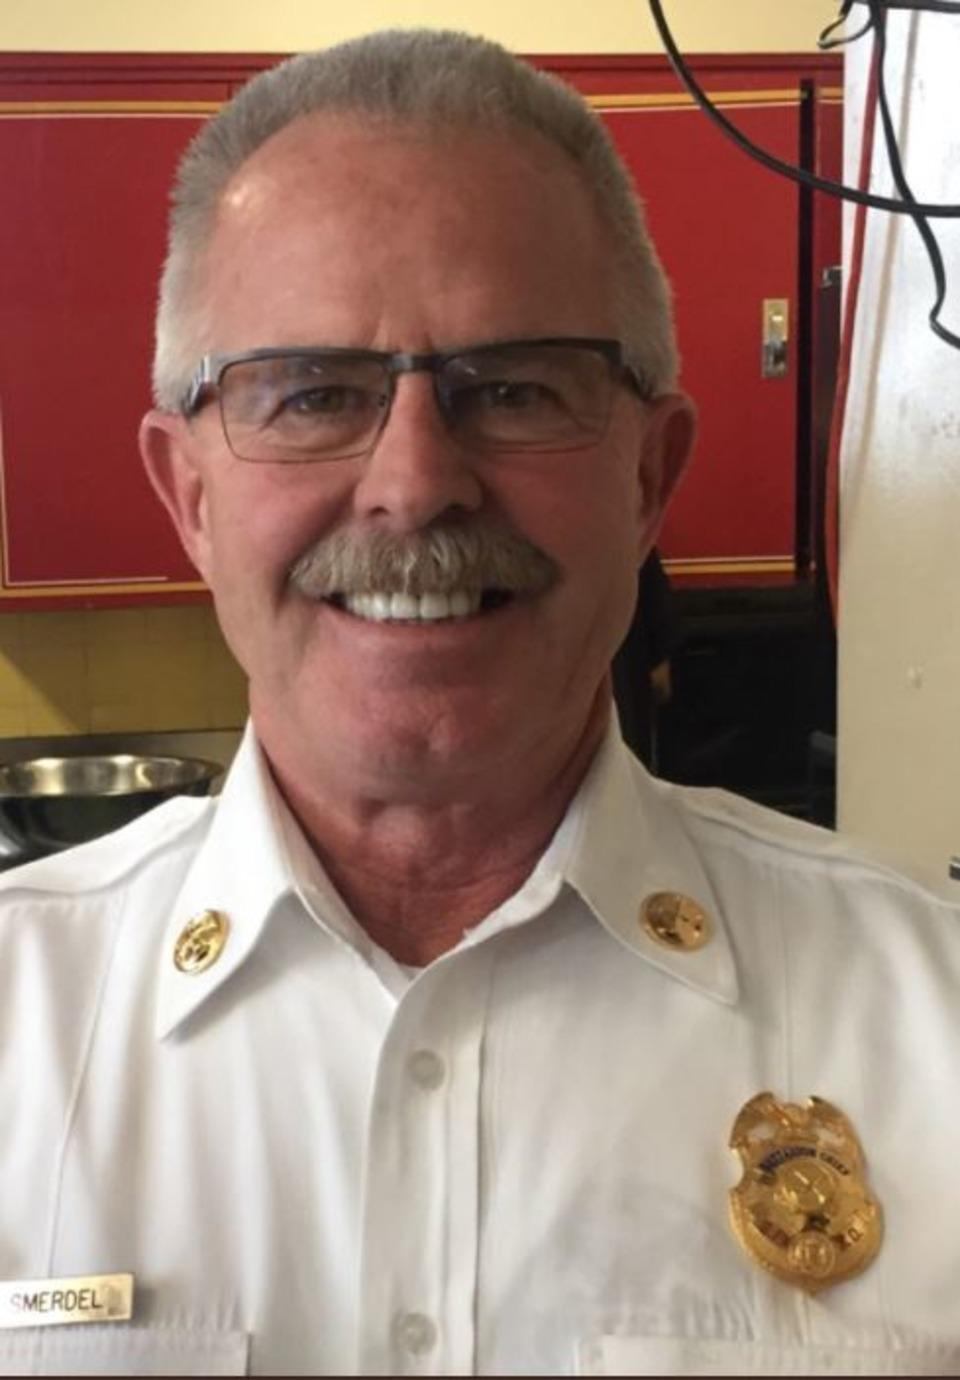 San Francisco Battalion Chief Dies While on Shift